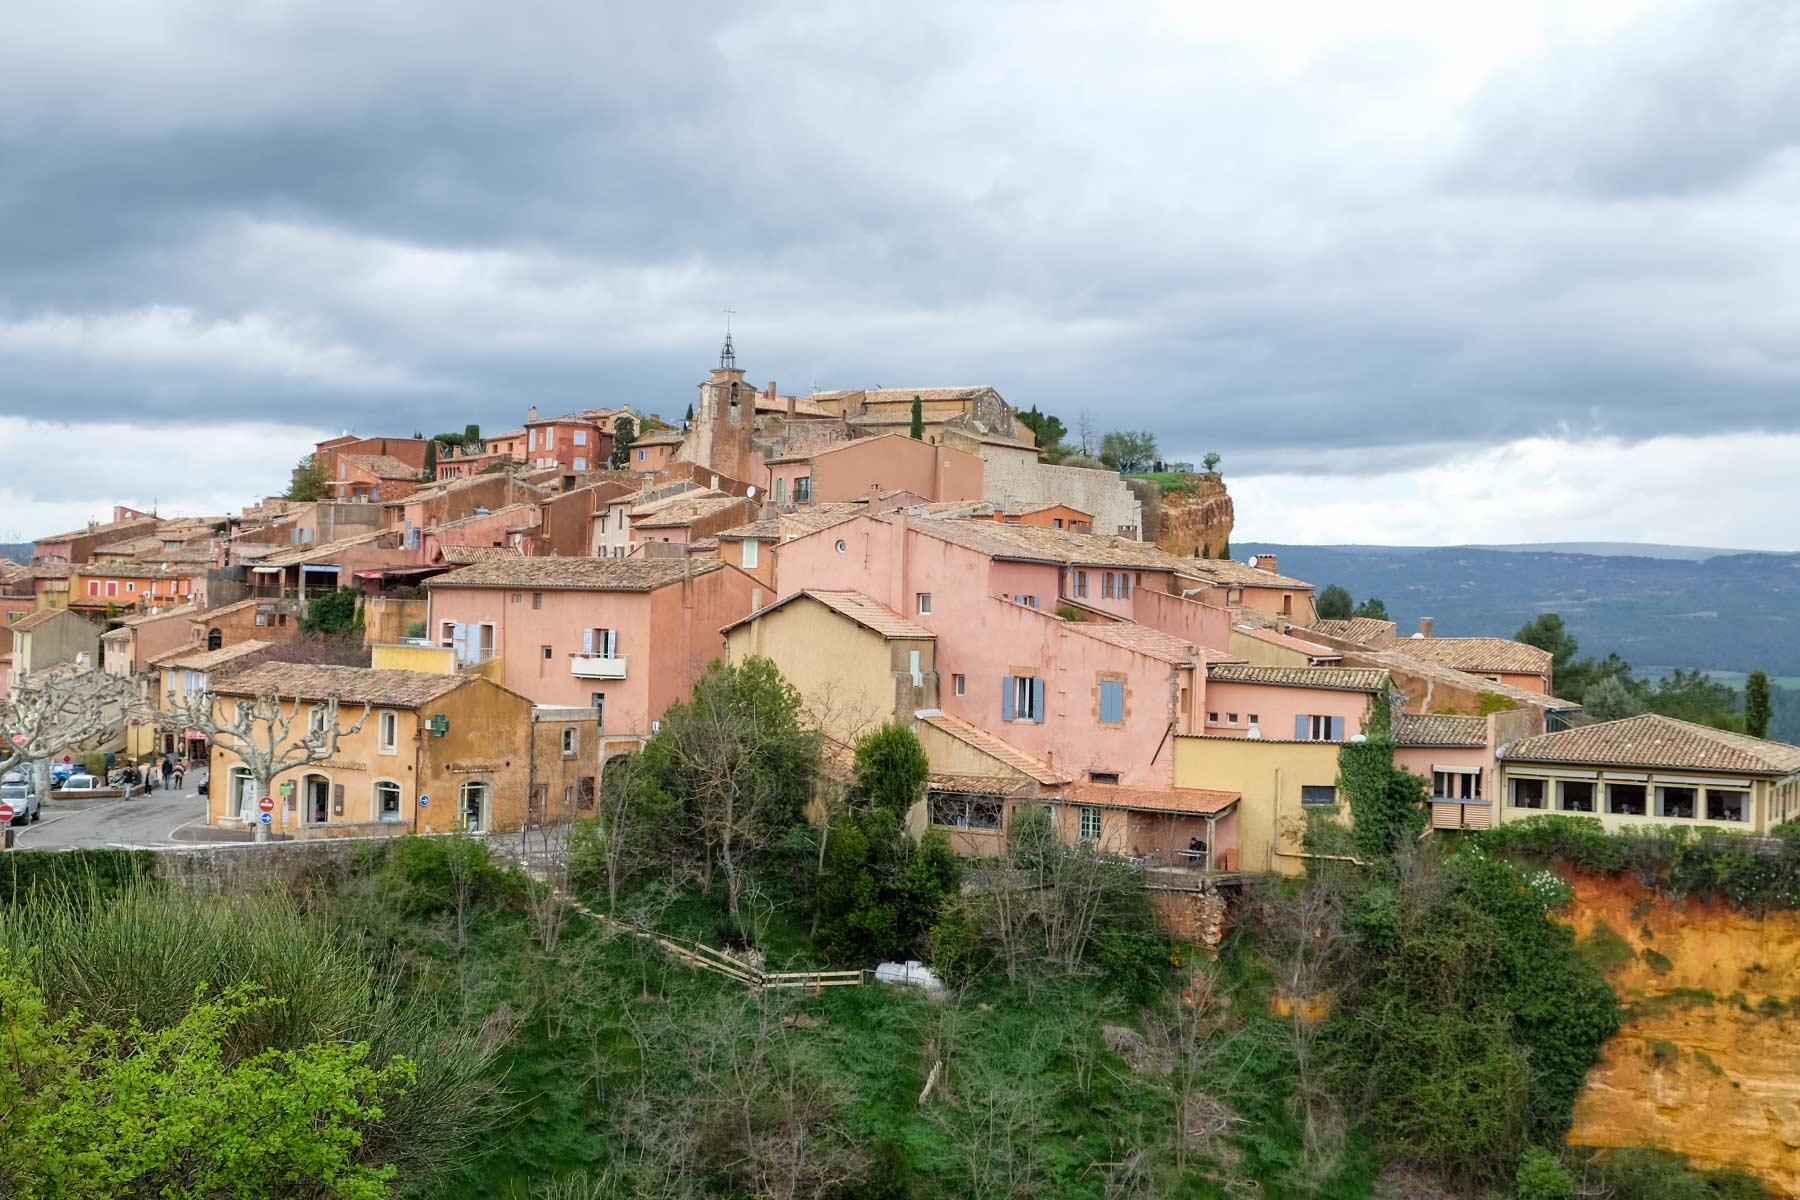 Blick auf Roussillon in der Provence, Frankreich